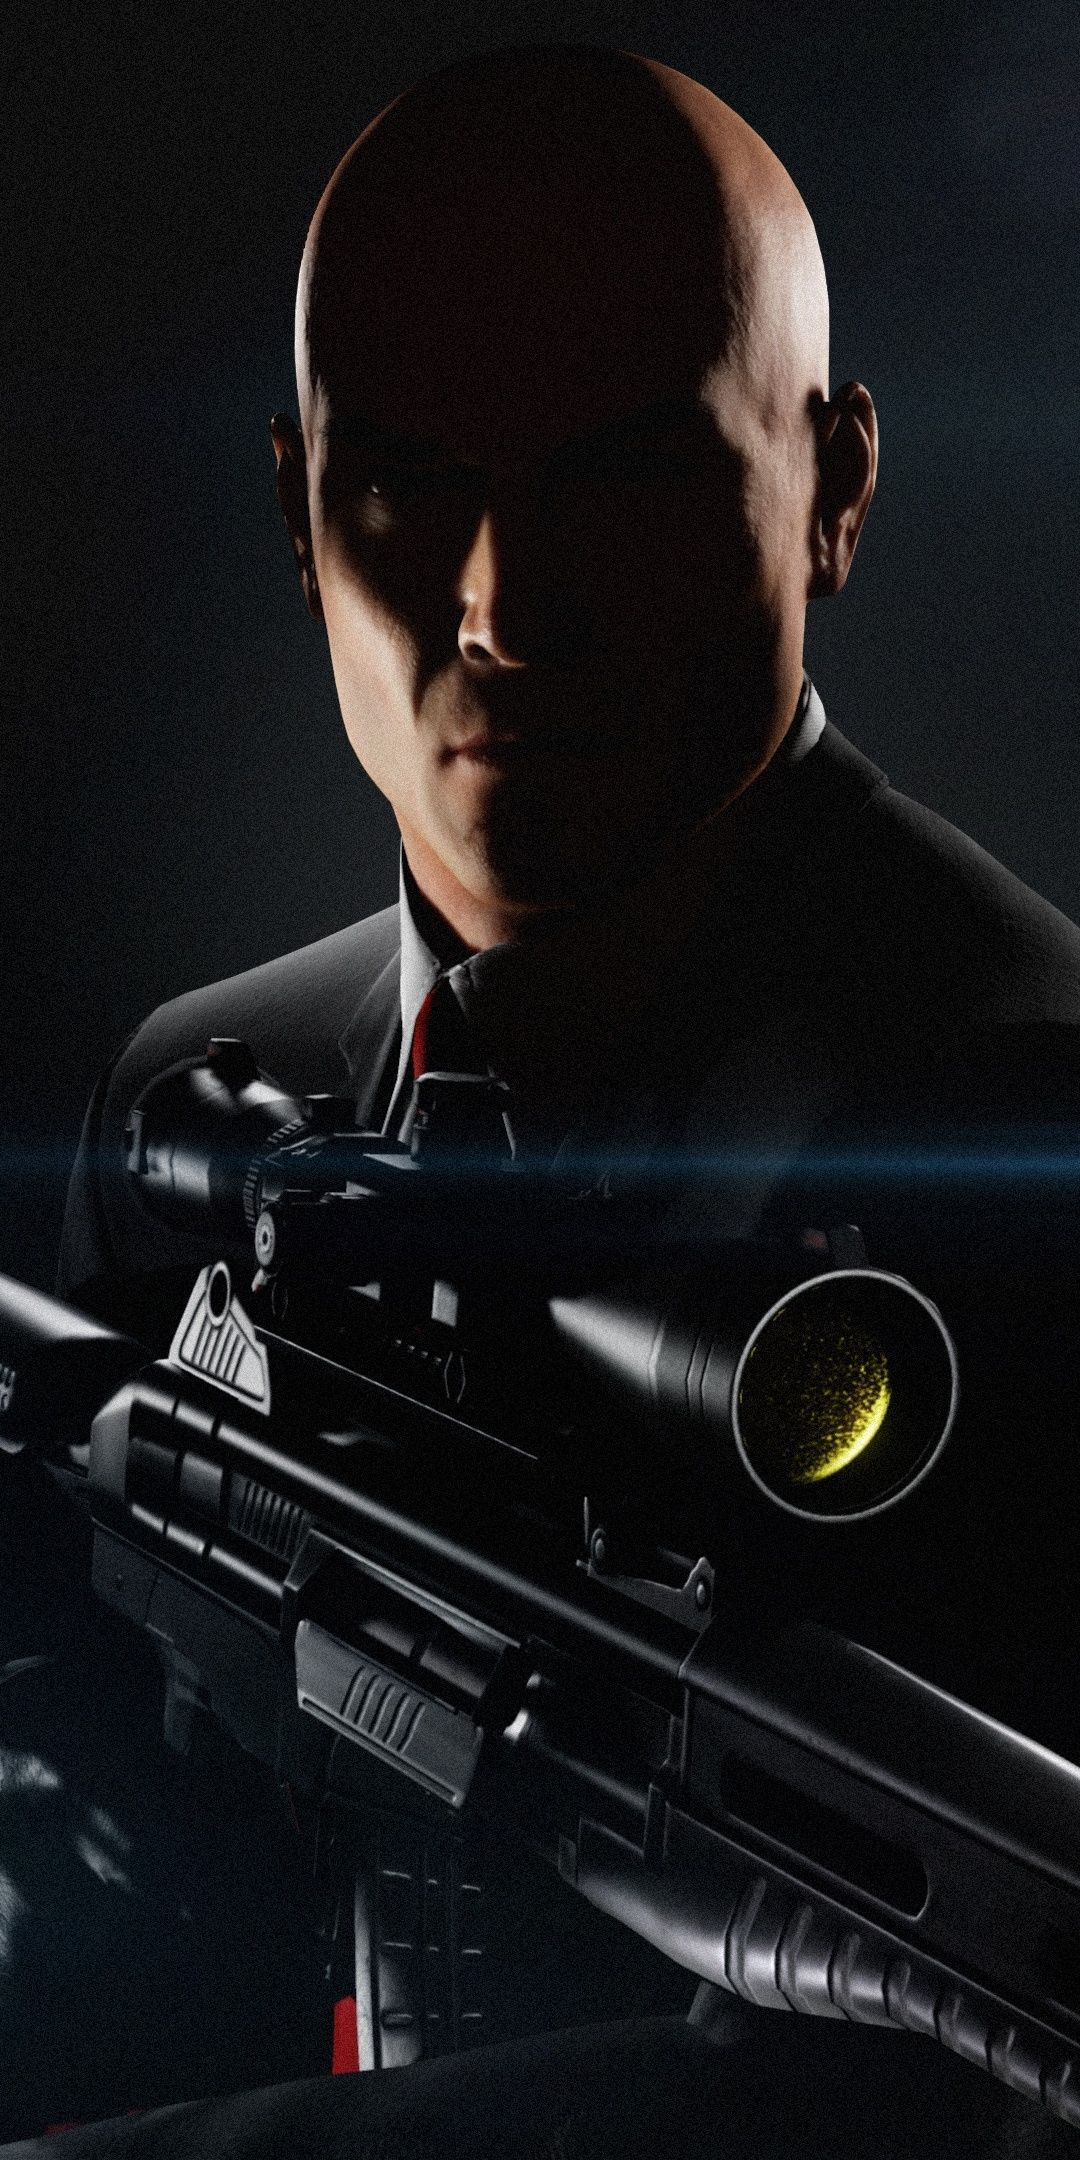 Hitman 2 Sniper Assassin Wallpaper Hitman Agent 47 Agent 47 Hitman